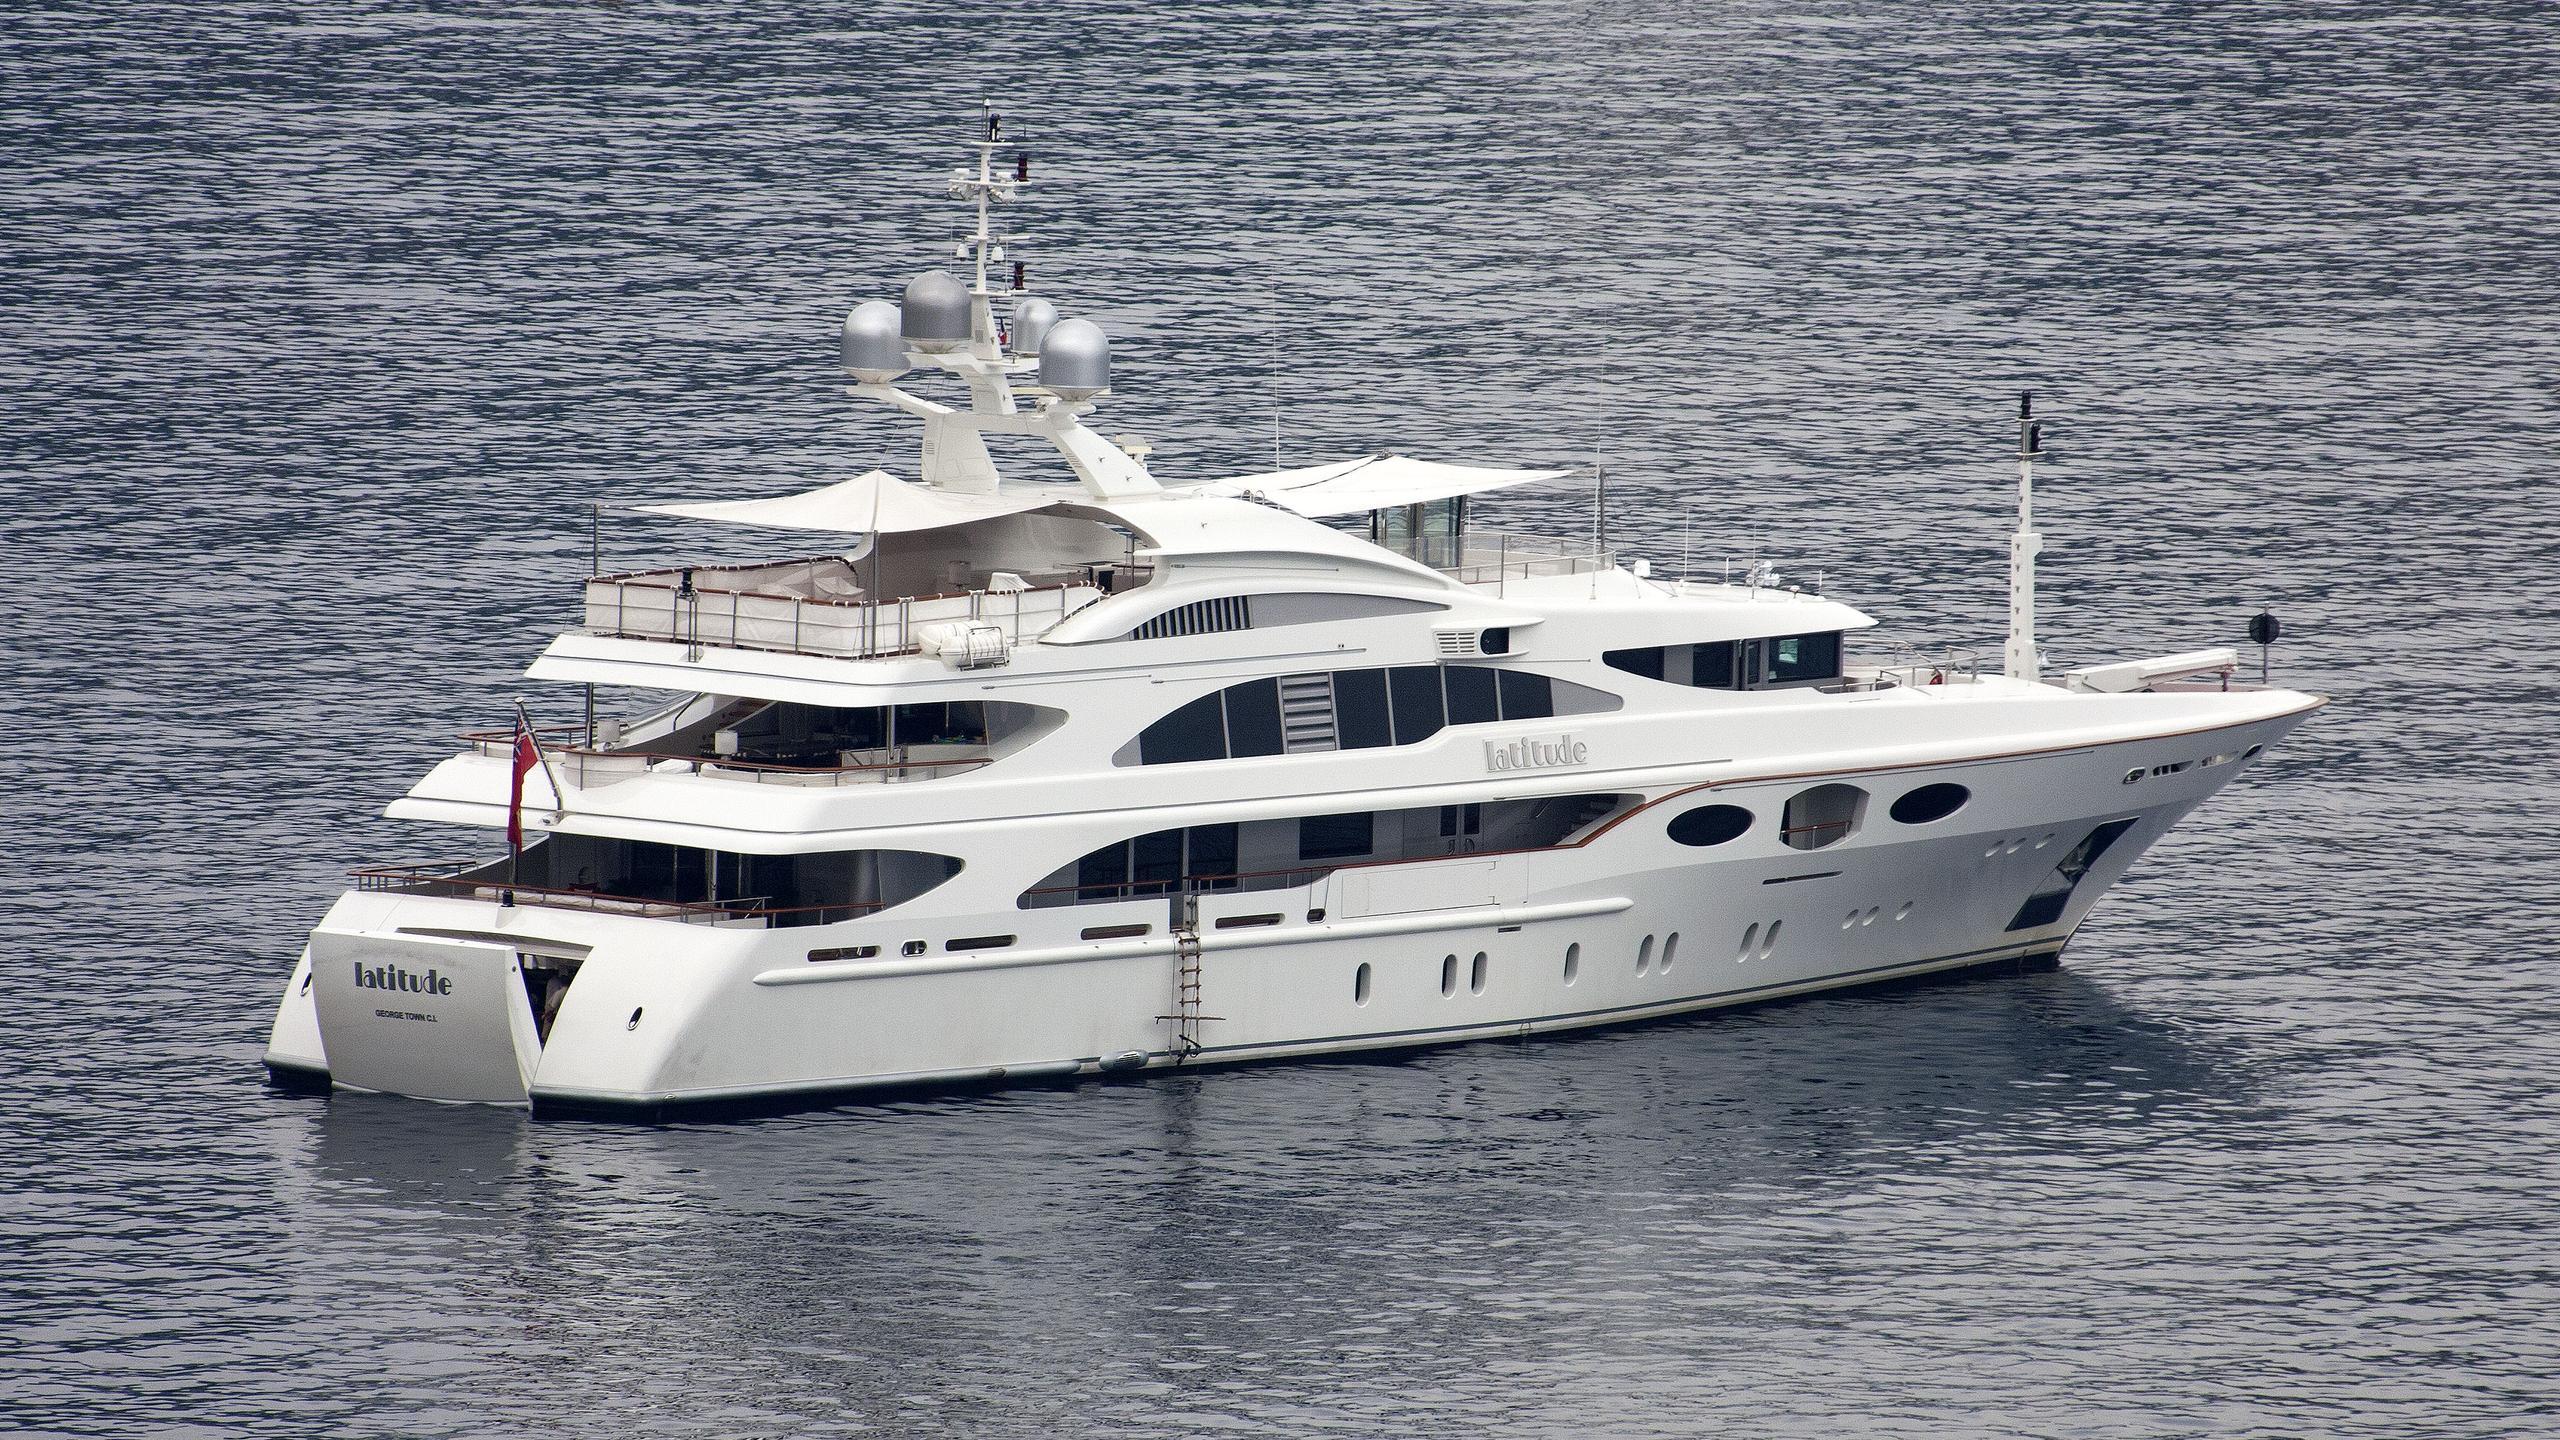 latitude-motor-yacht-benetti-2008-52m-half-profile